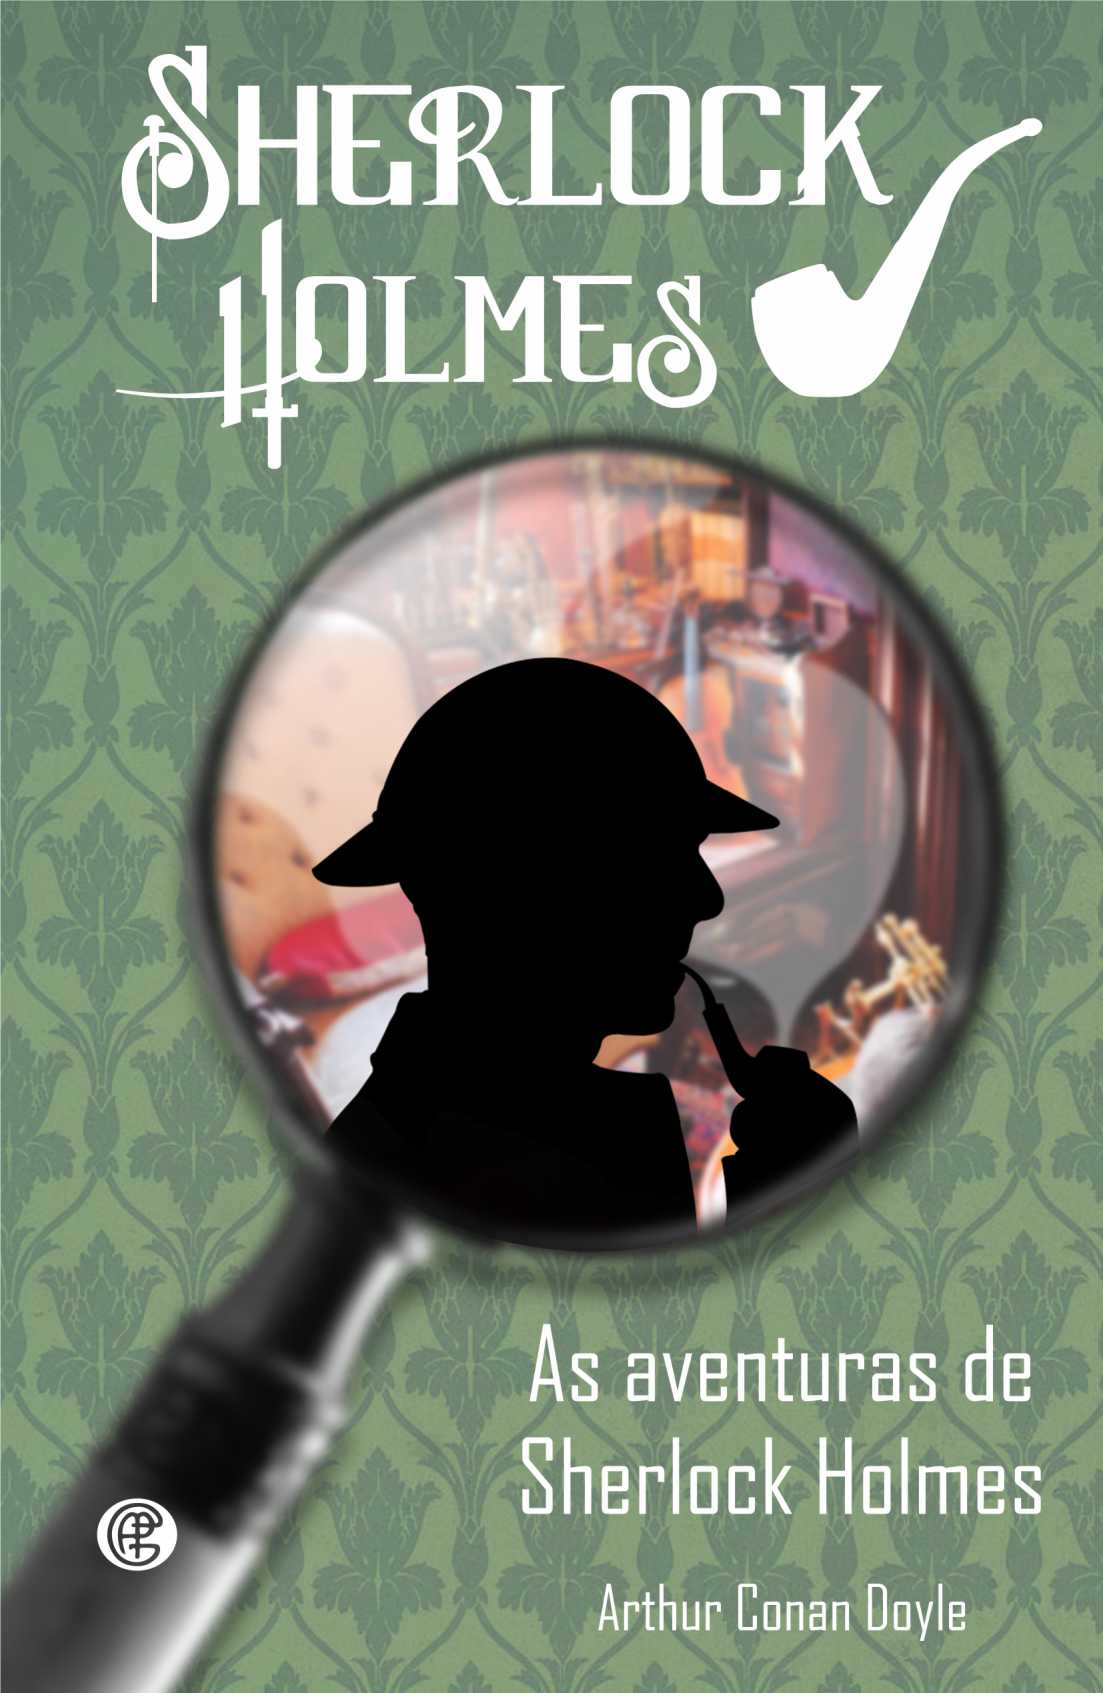 Aventuras de Sherlock Holmes, As - ( Garnier )